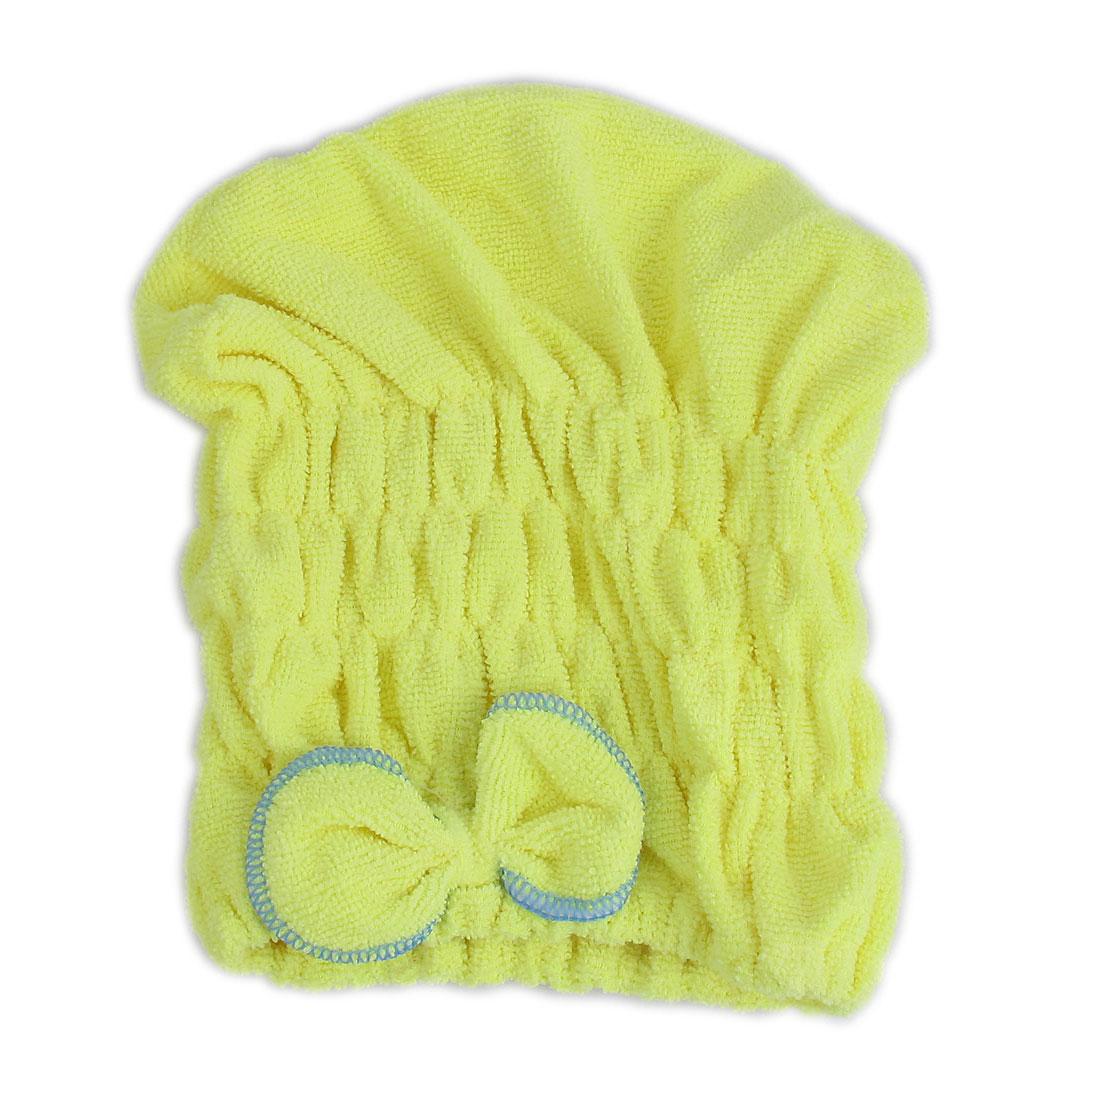 Lady Gym Travel Swimming Shower Yellow Microfibre Elastic Hair Fast Dry Drying Cap Turban Towel